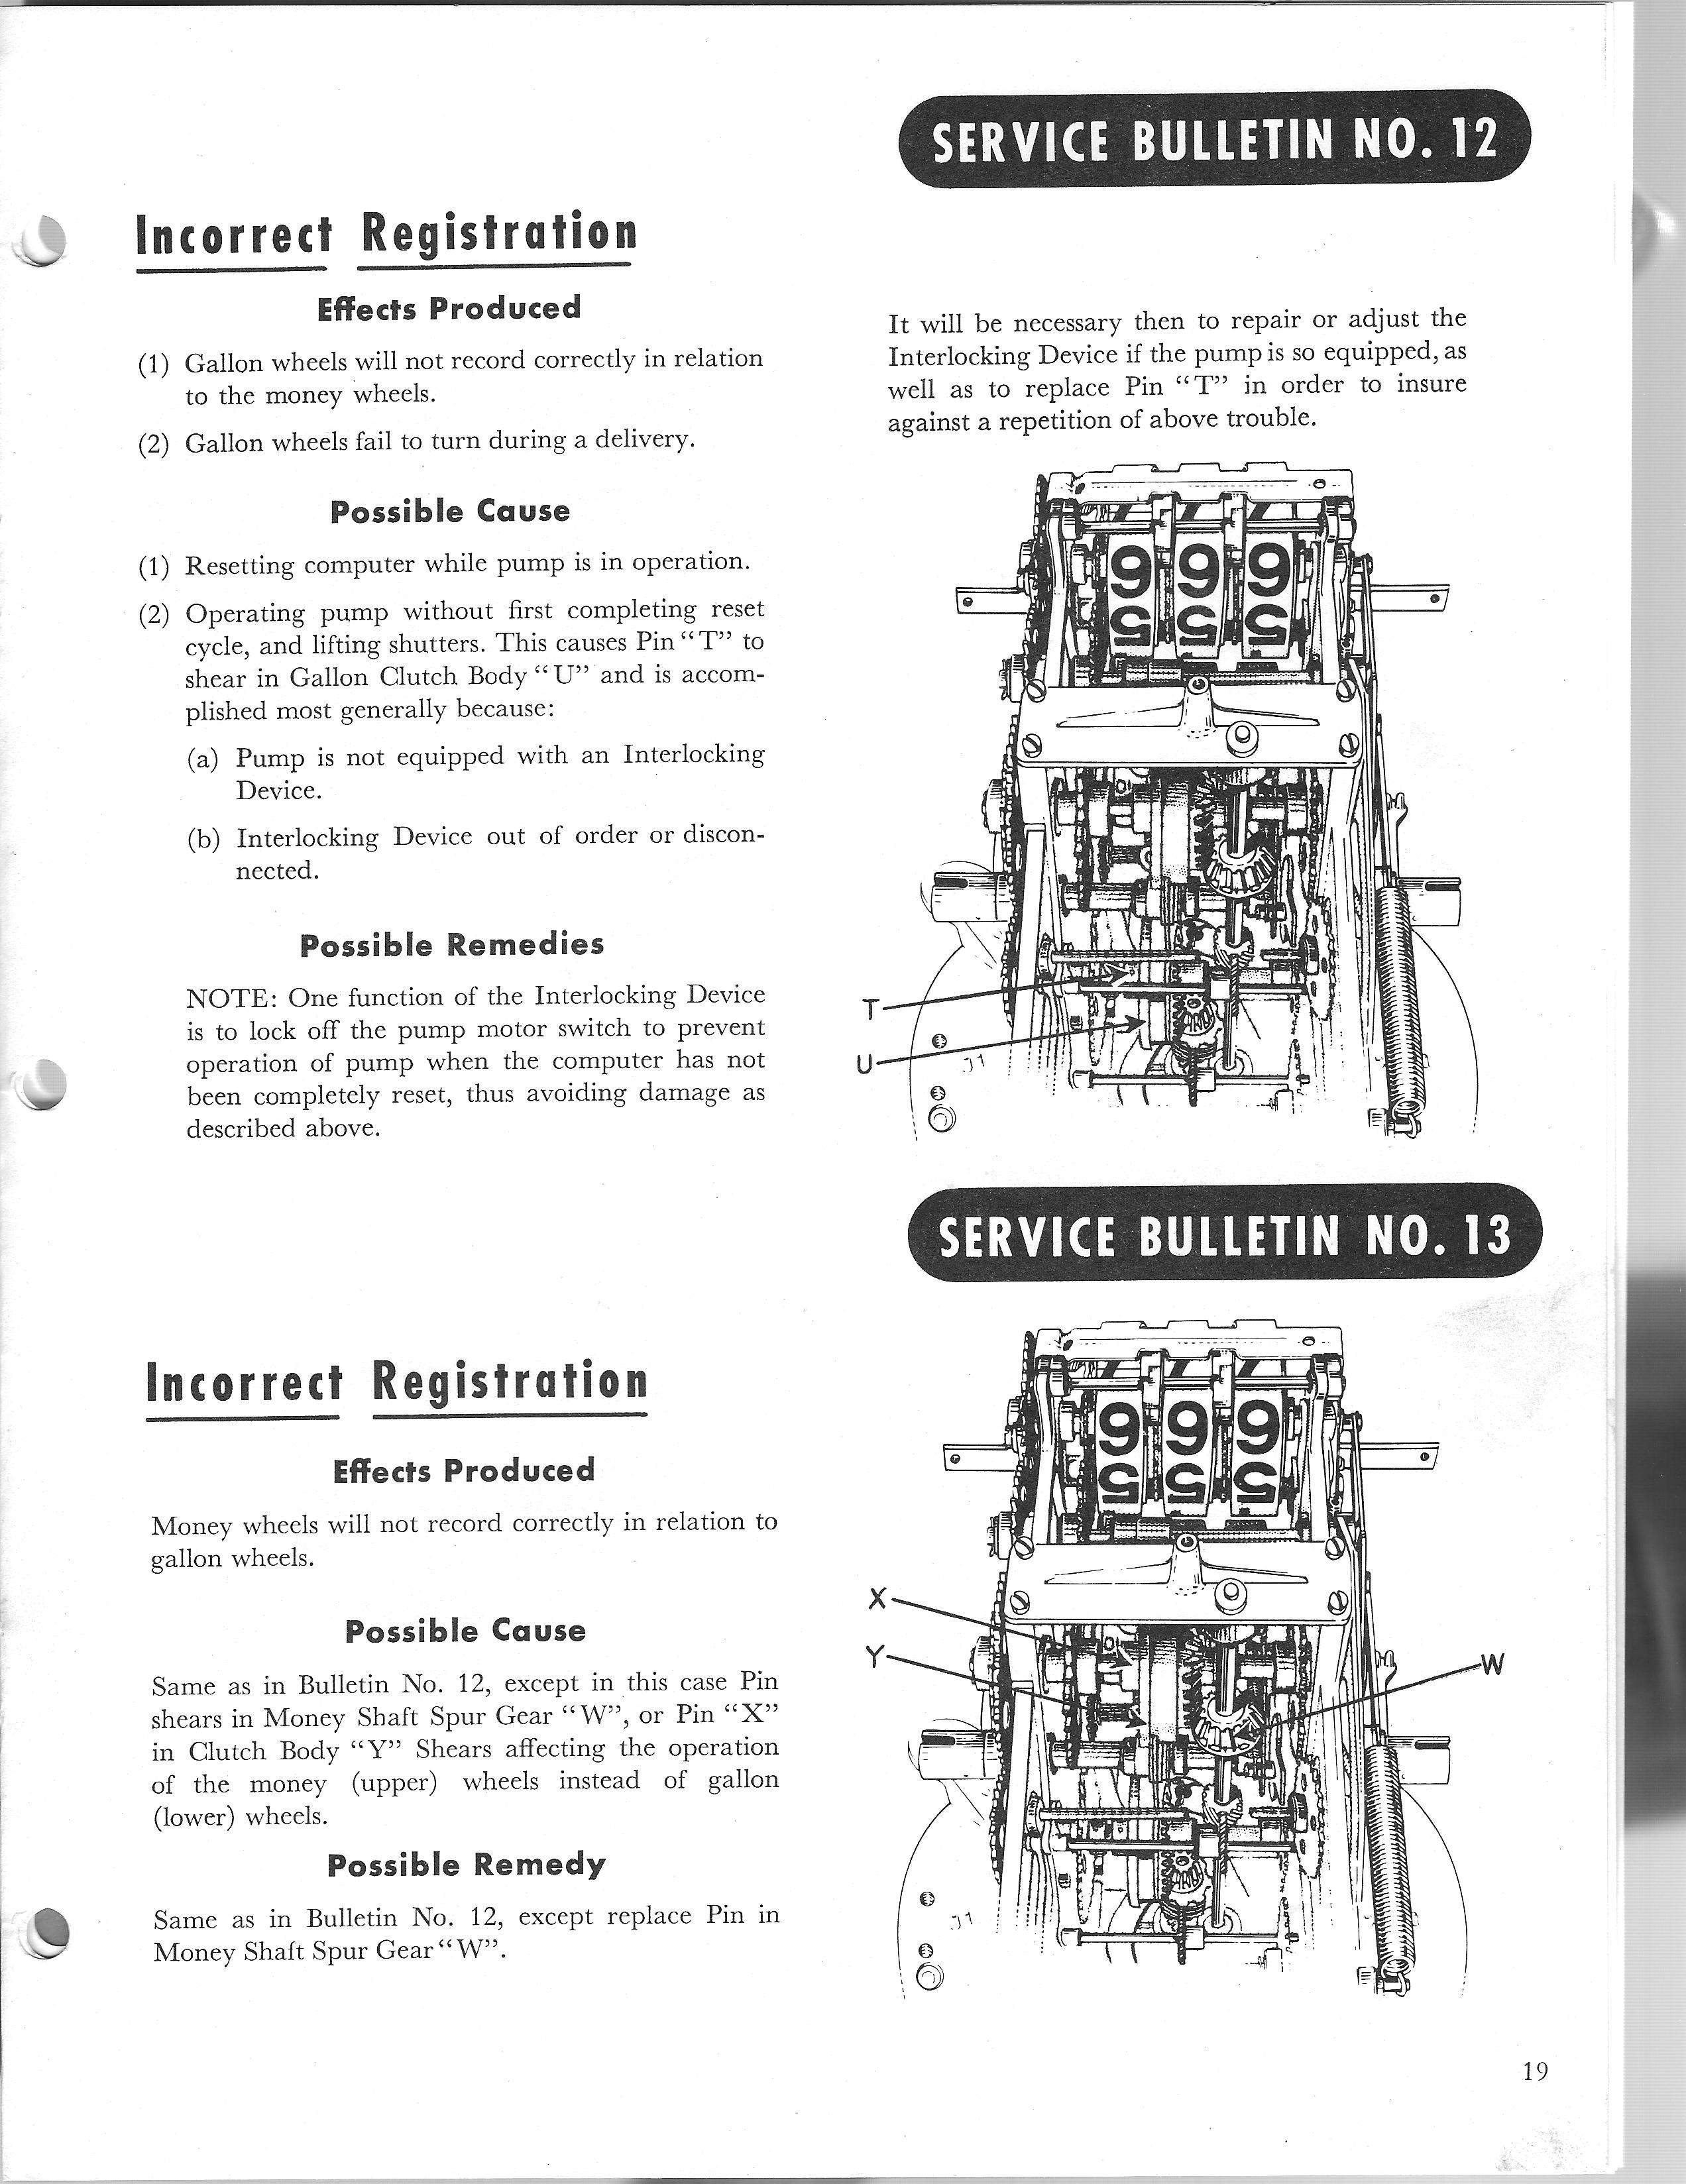 Pool Pump Schematic Manual Guide